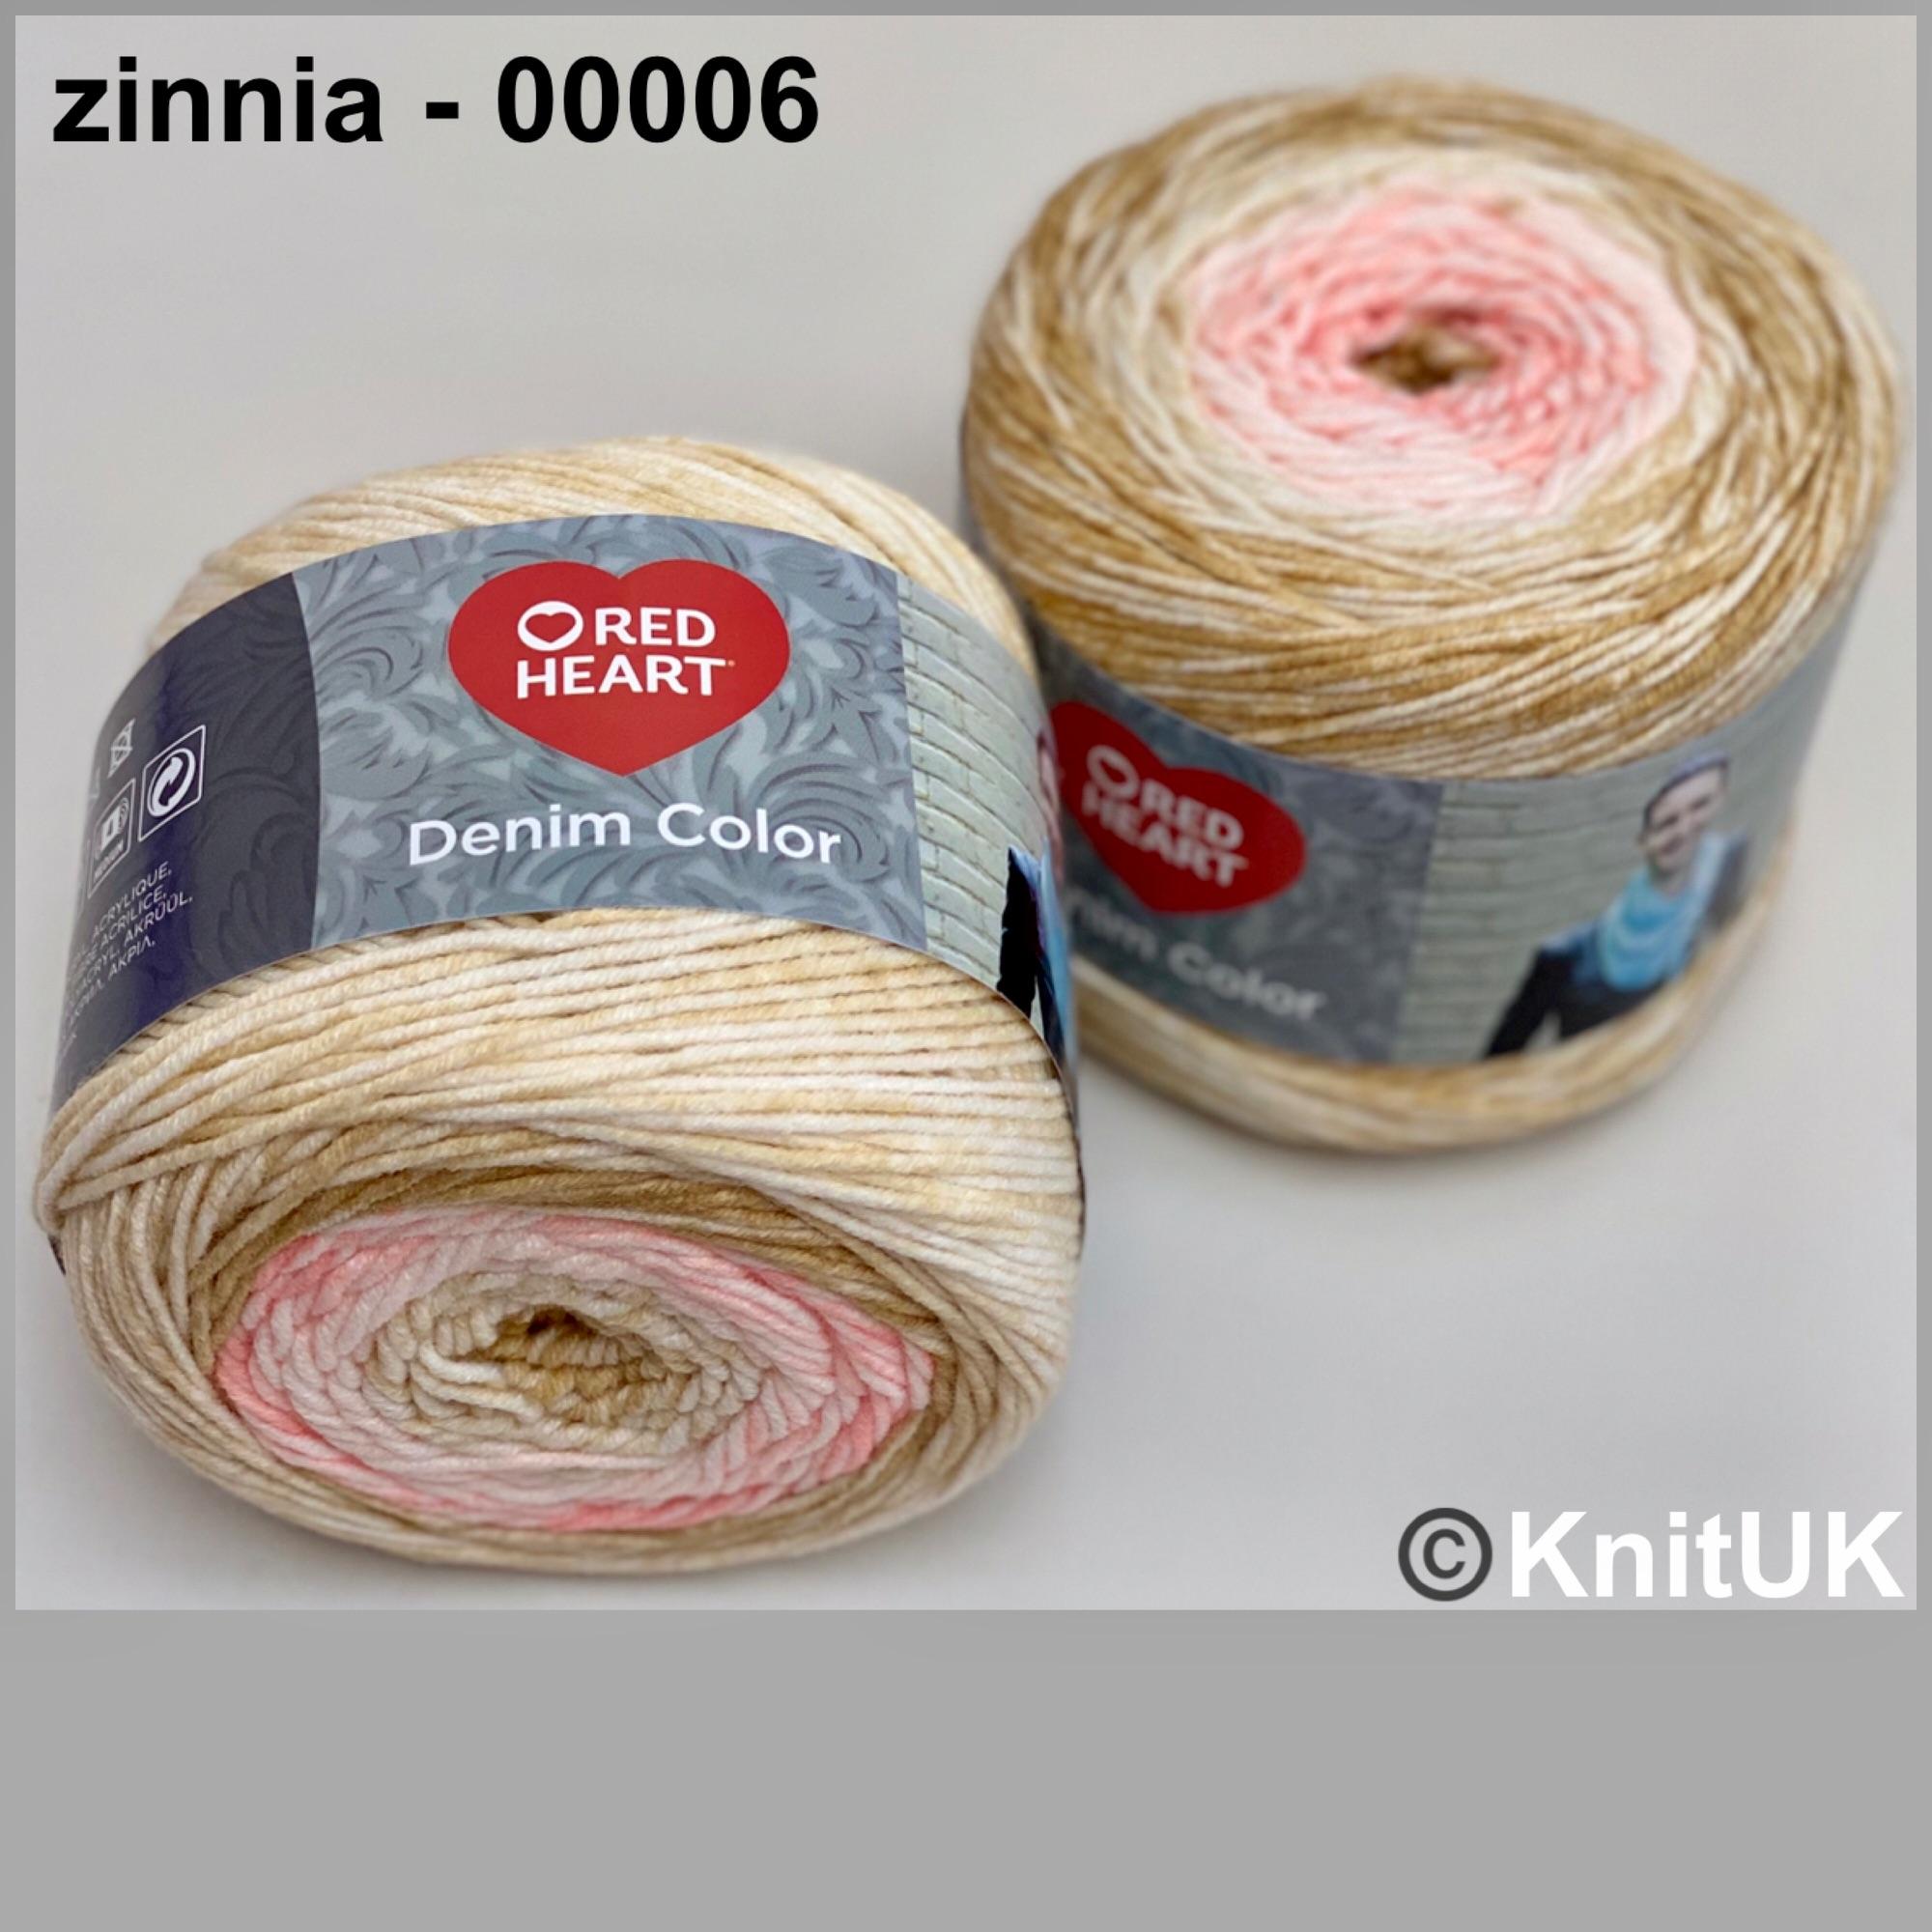 Red heart denim color zinnia colour acrylic yarn loom knitting crochet